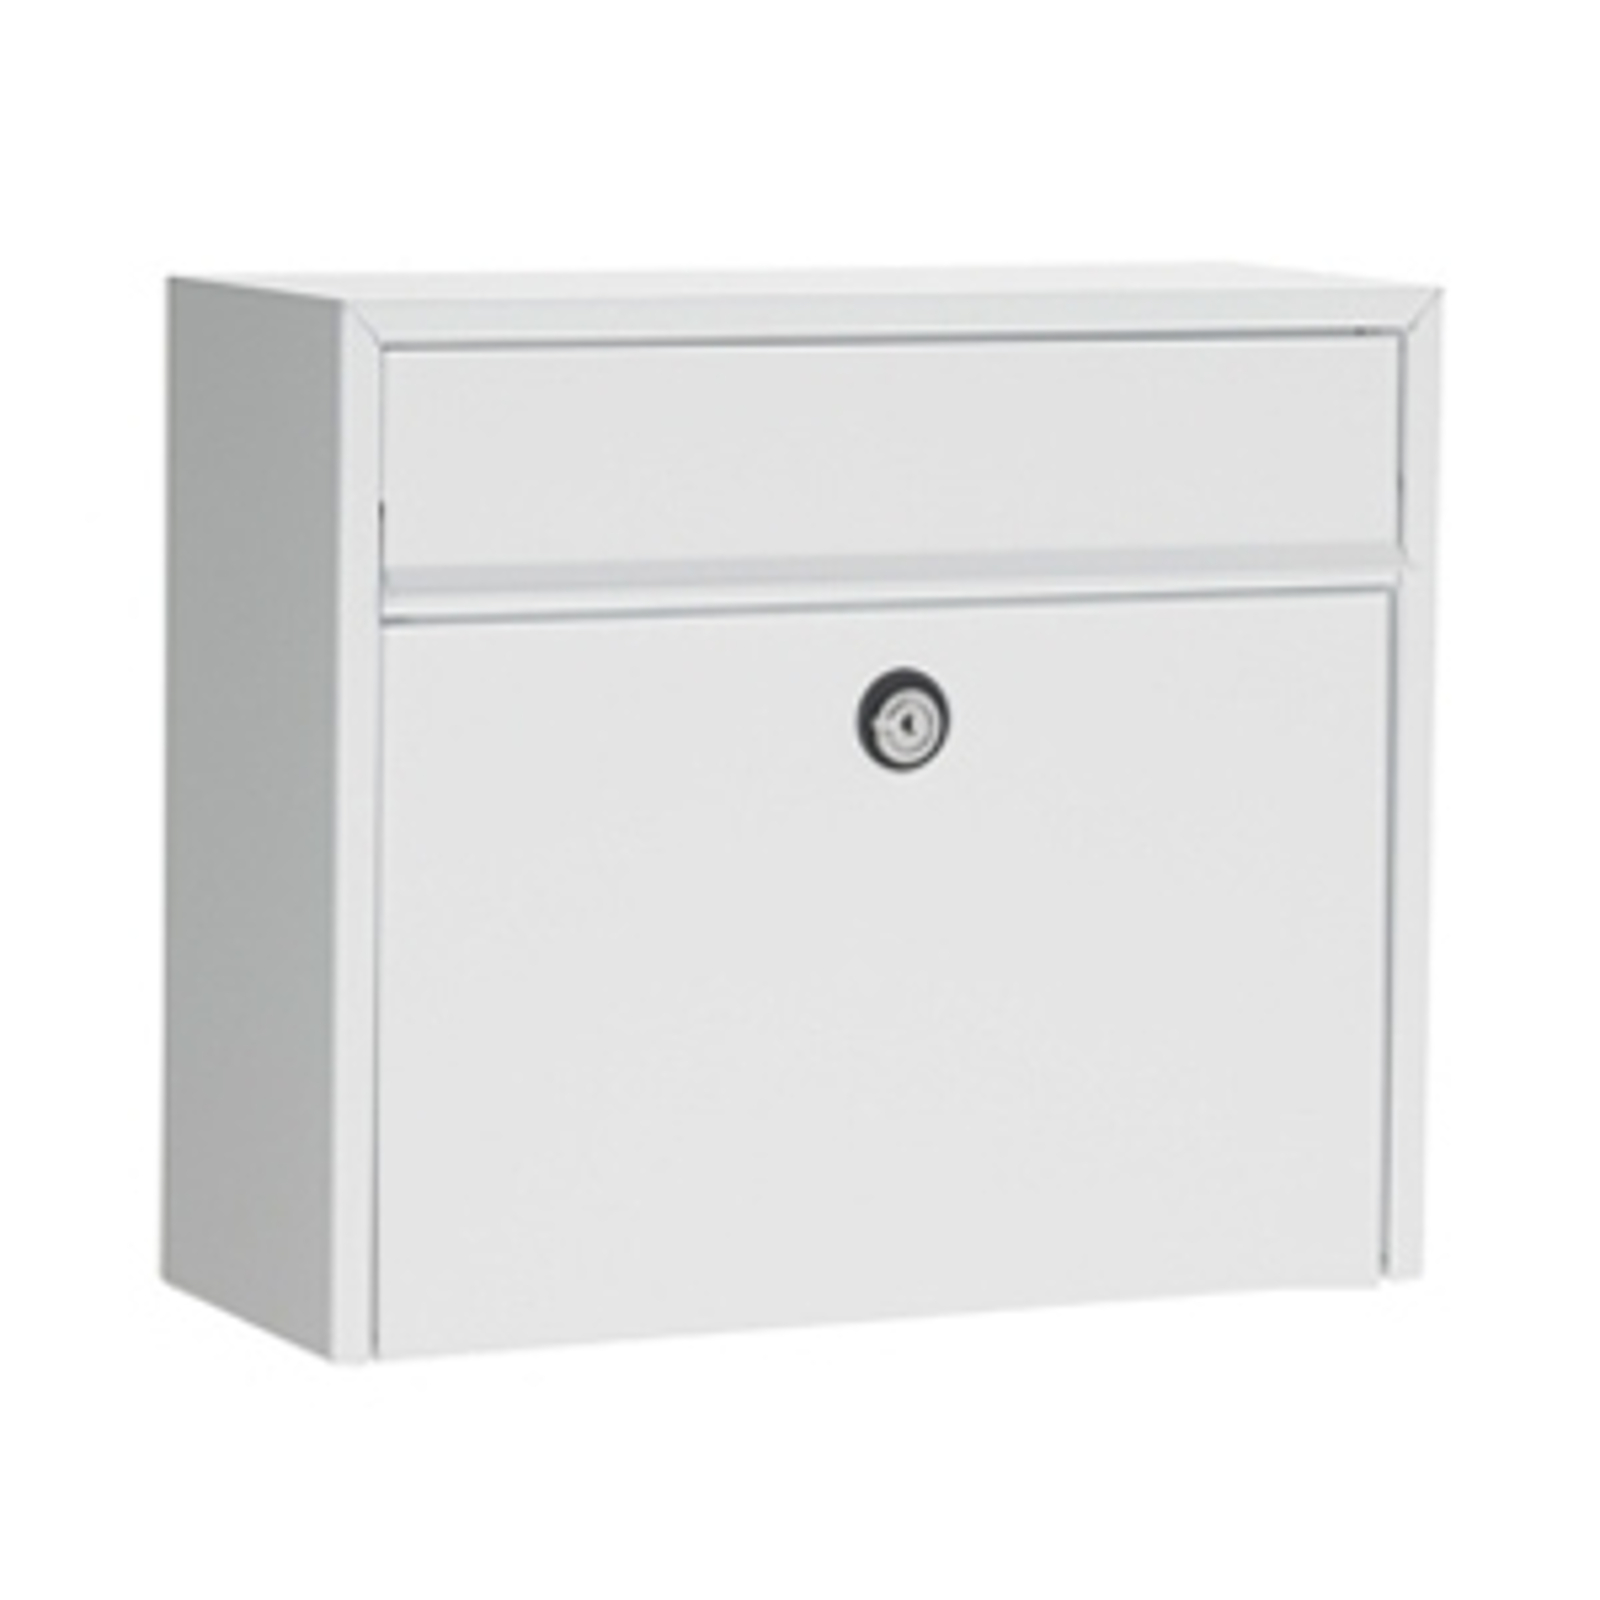 Enkel postlåda LT150, vit, Eurolås